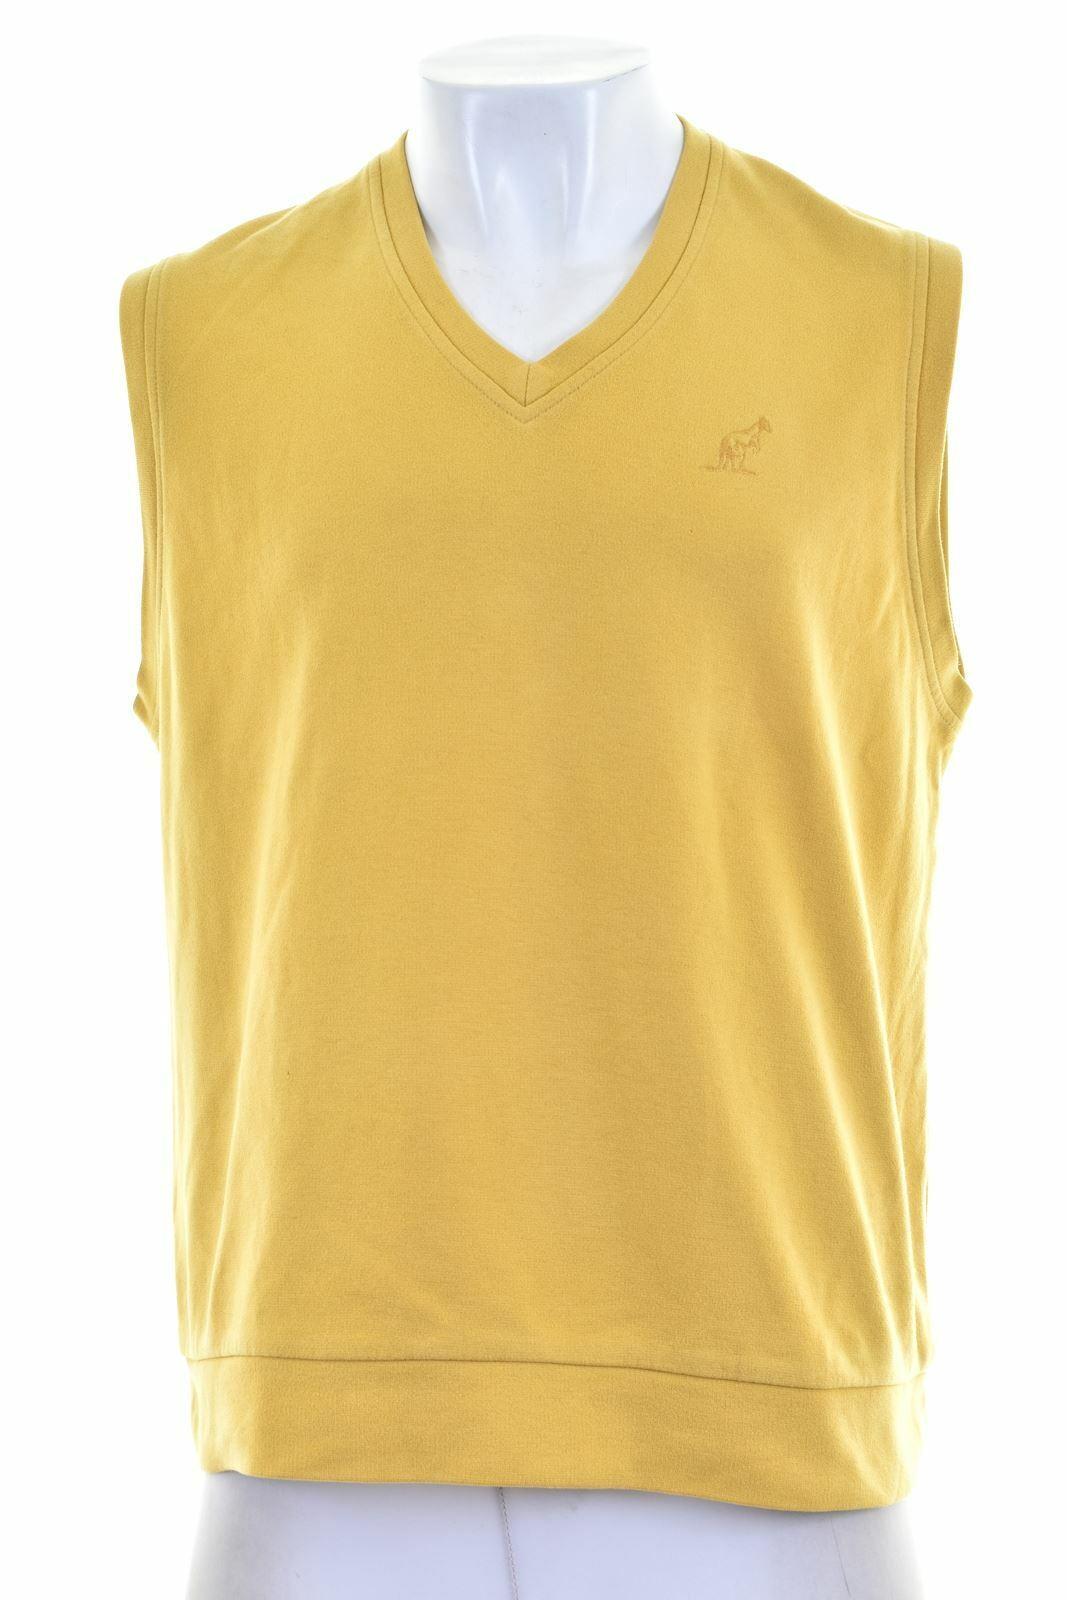 AUSTRALIAN L'ALPINA Mens Sweatshirt Jumper Sleeveless IT 52 Large Yellow NP01